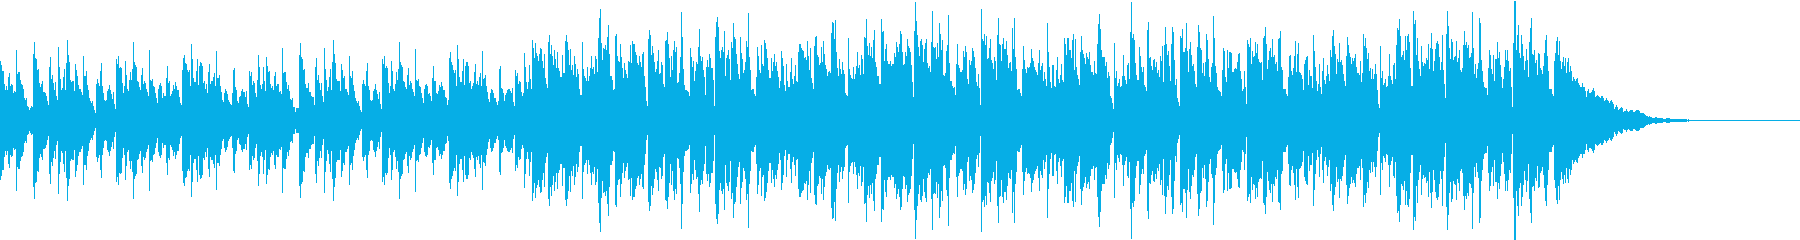 Pf「戸惑」和風現代ジャズの再生済みの波形